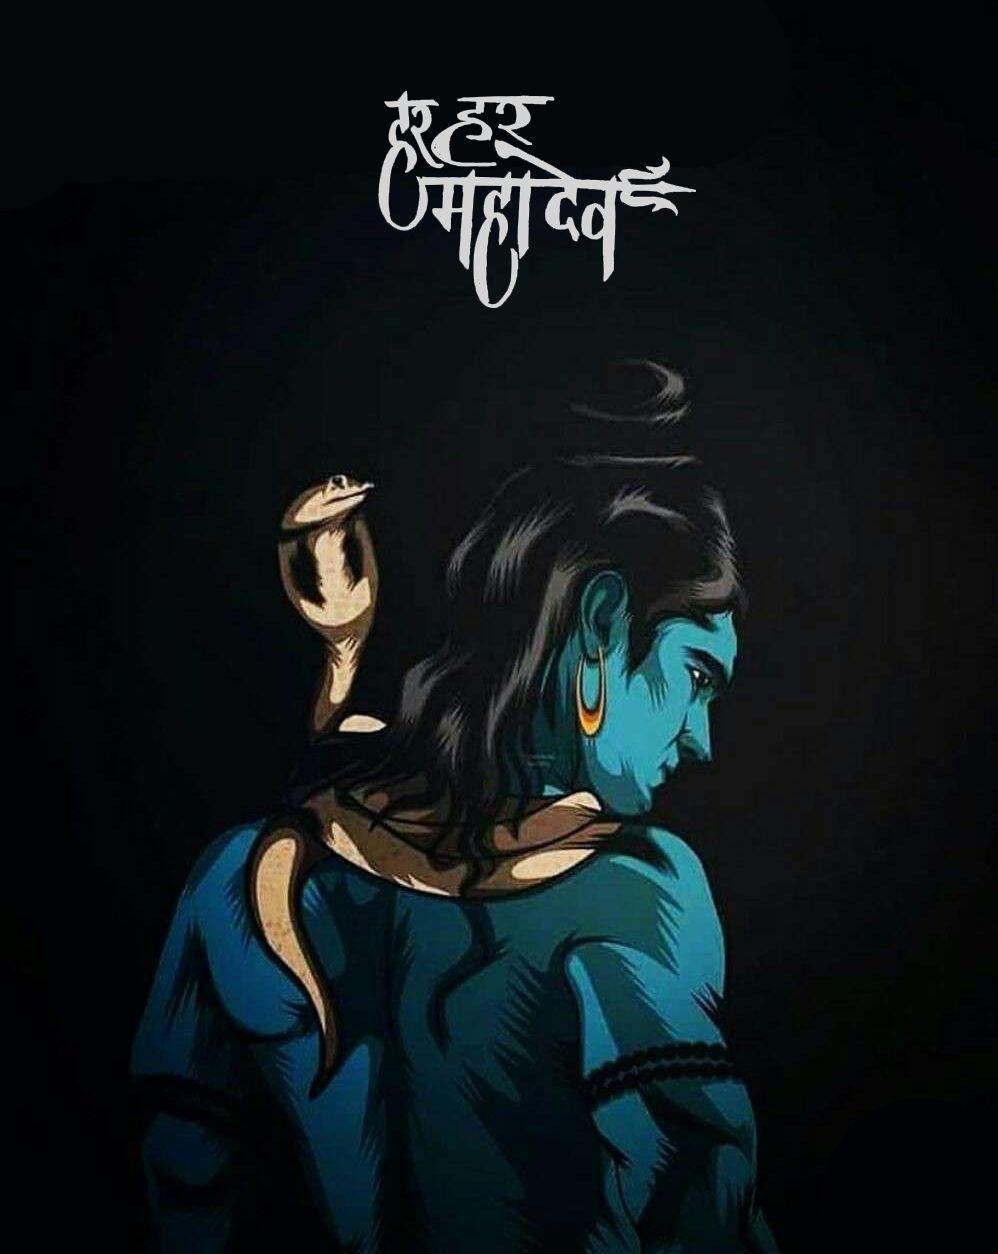 Mahadev Hd Wallpapers Top Free Mahadev Hd Backgrounds Wallpaperaccess